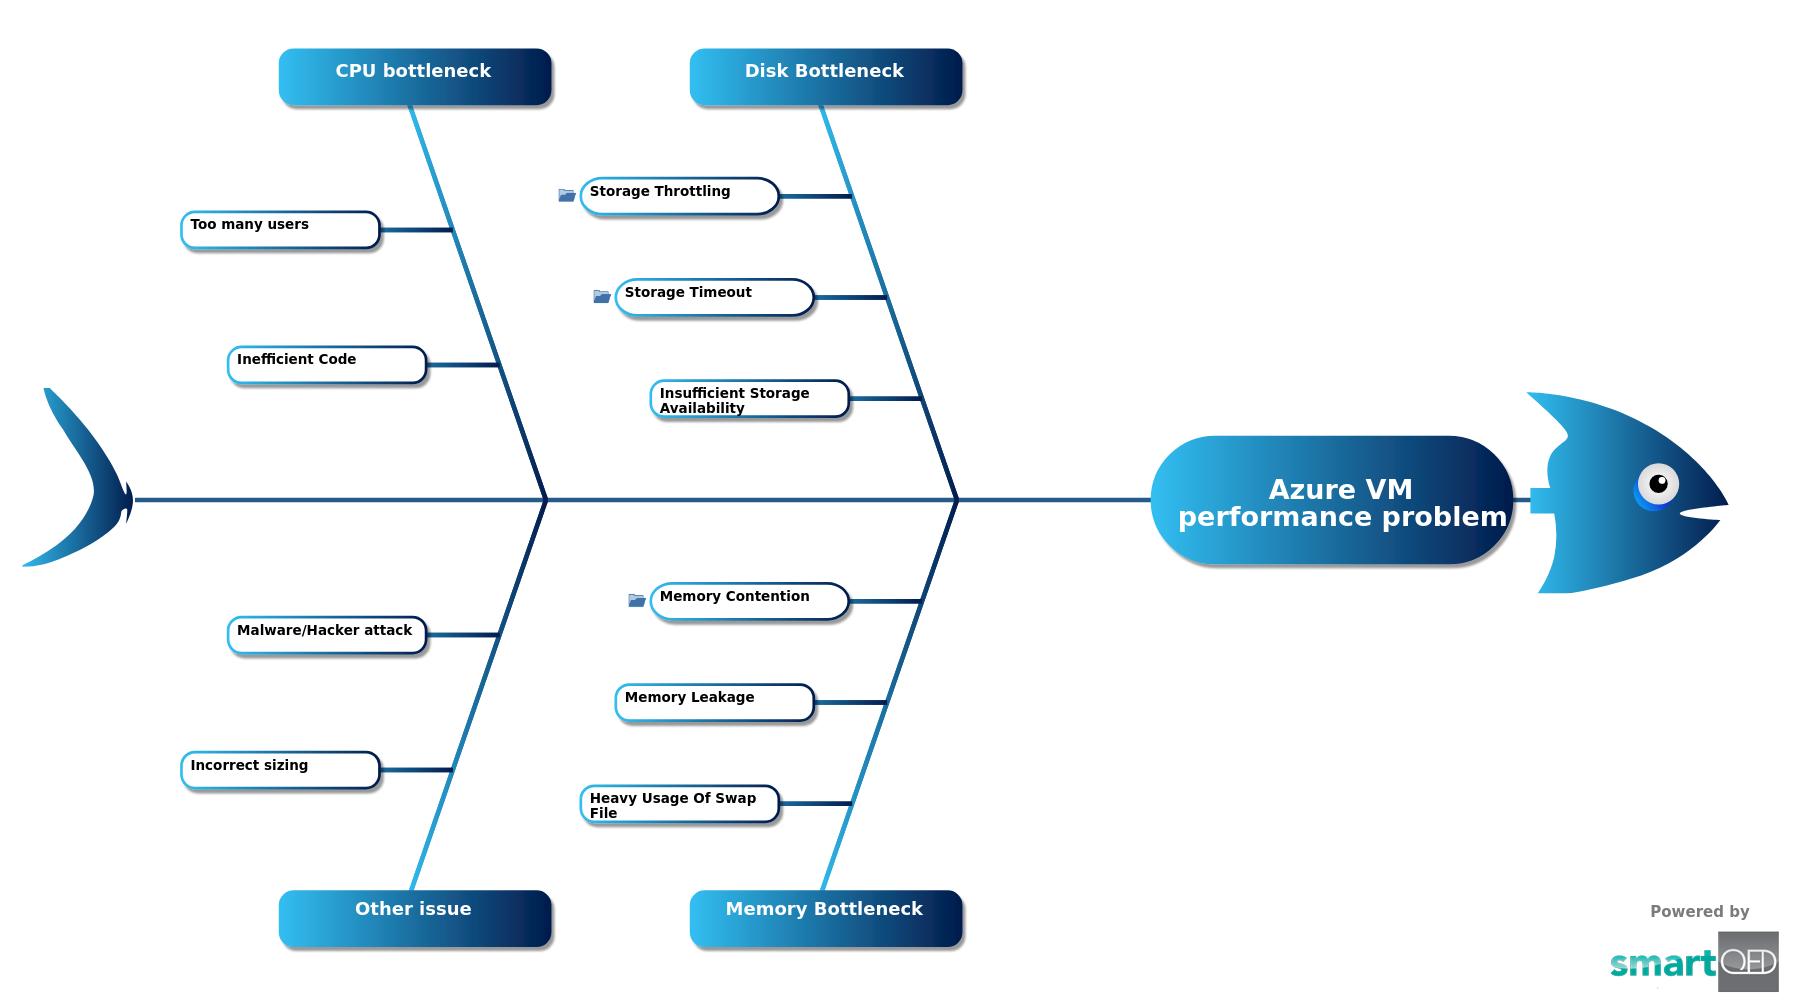 Azure VM Performance